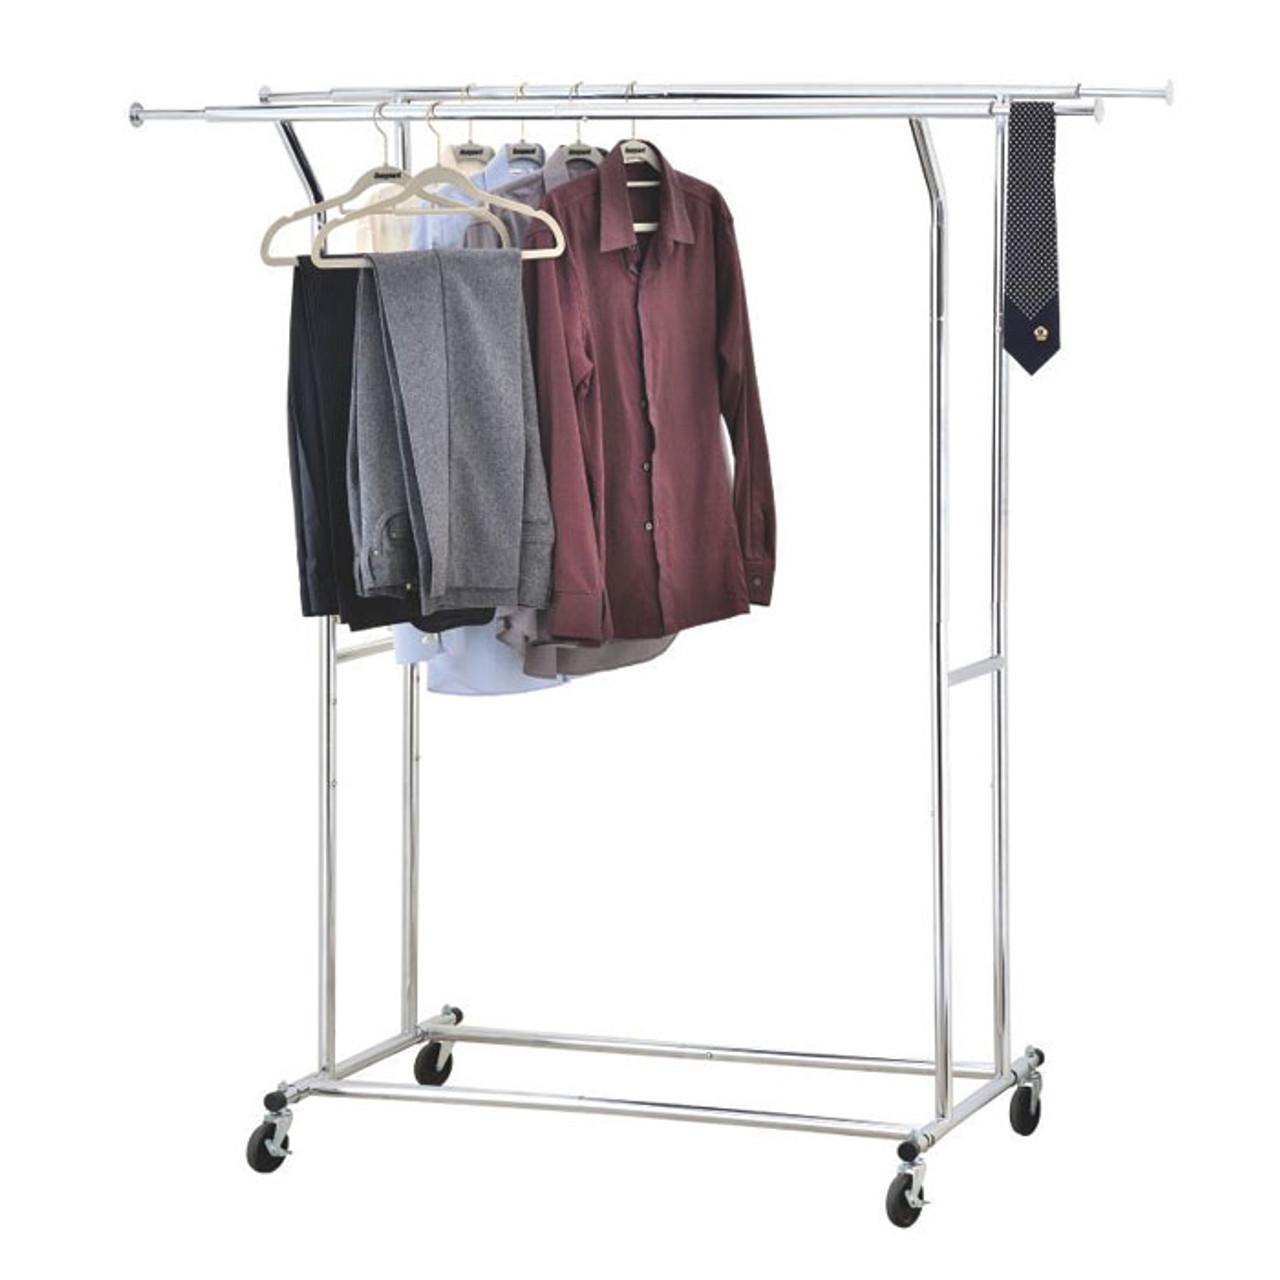 Double Commercial Garment Rack